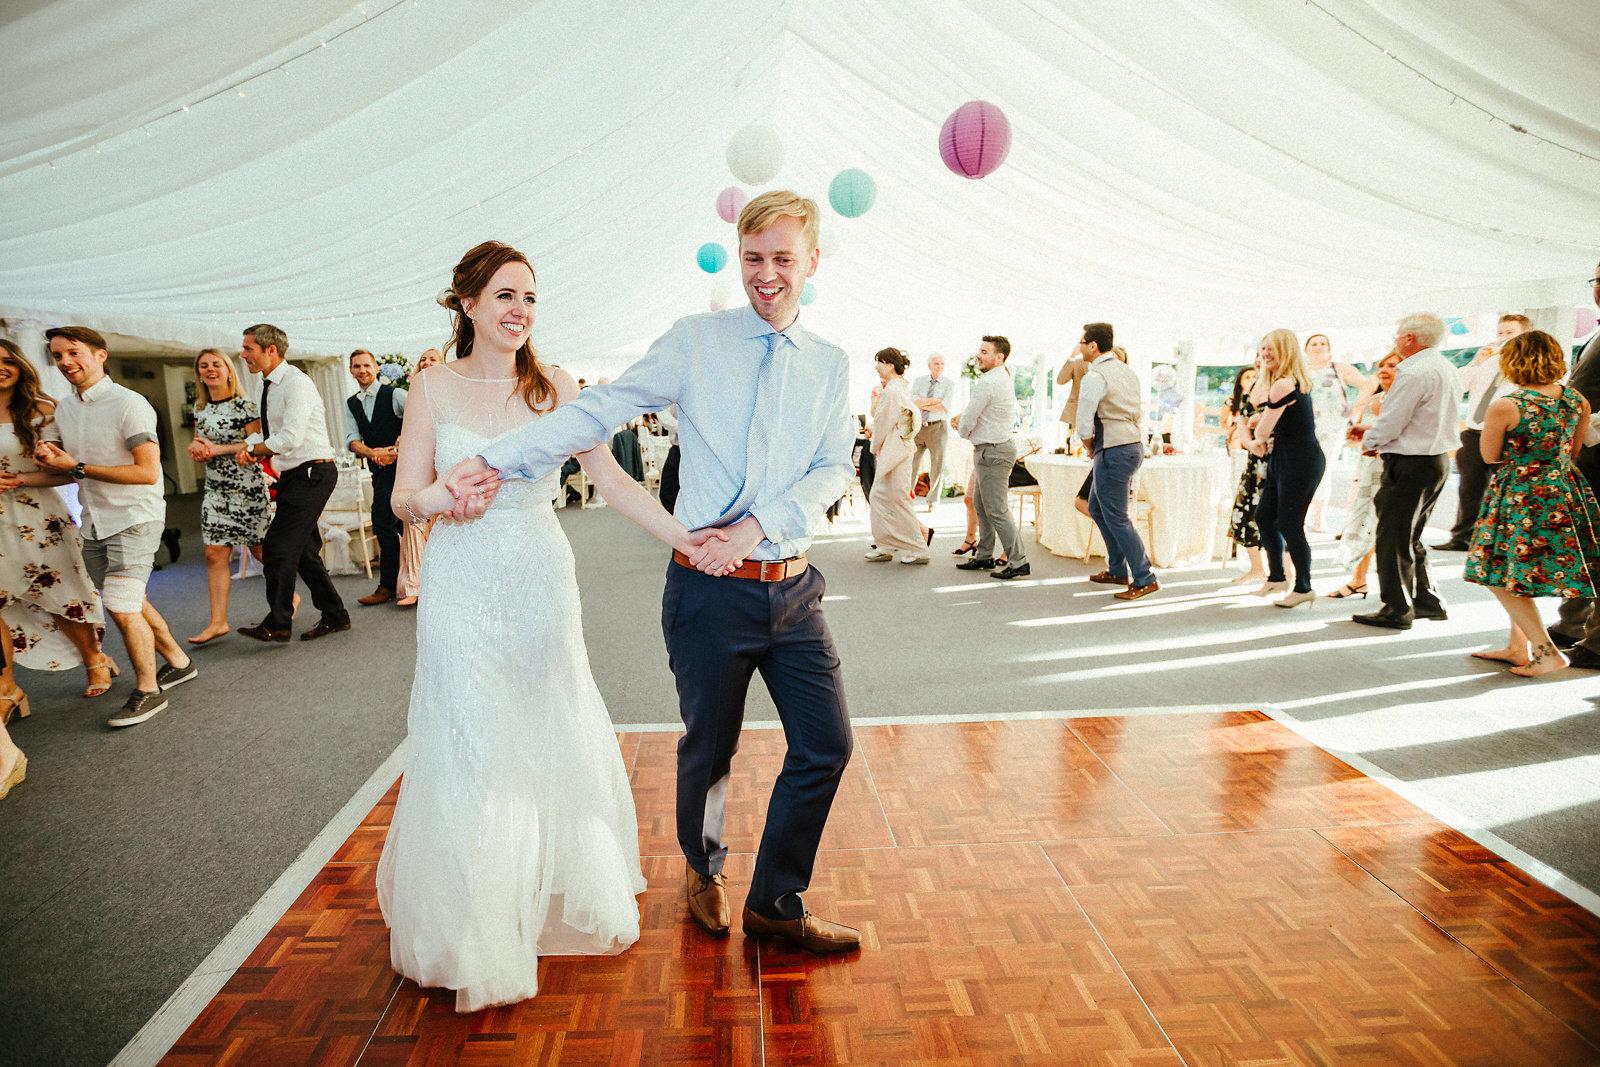 Ceilidh band for weddings